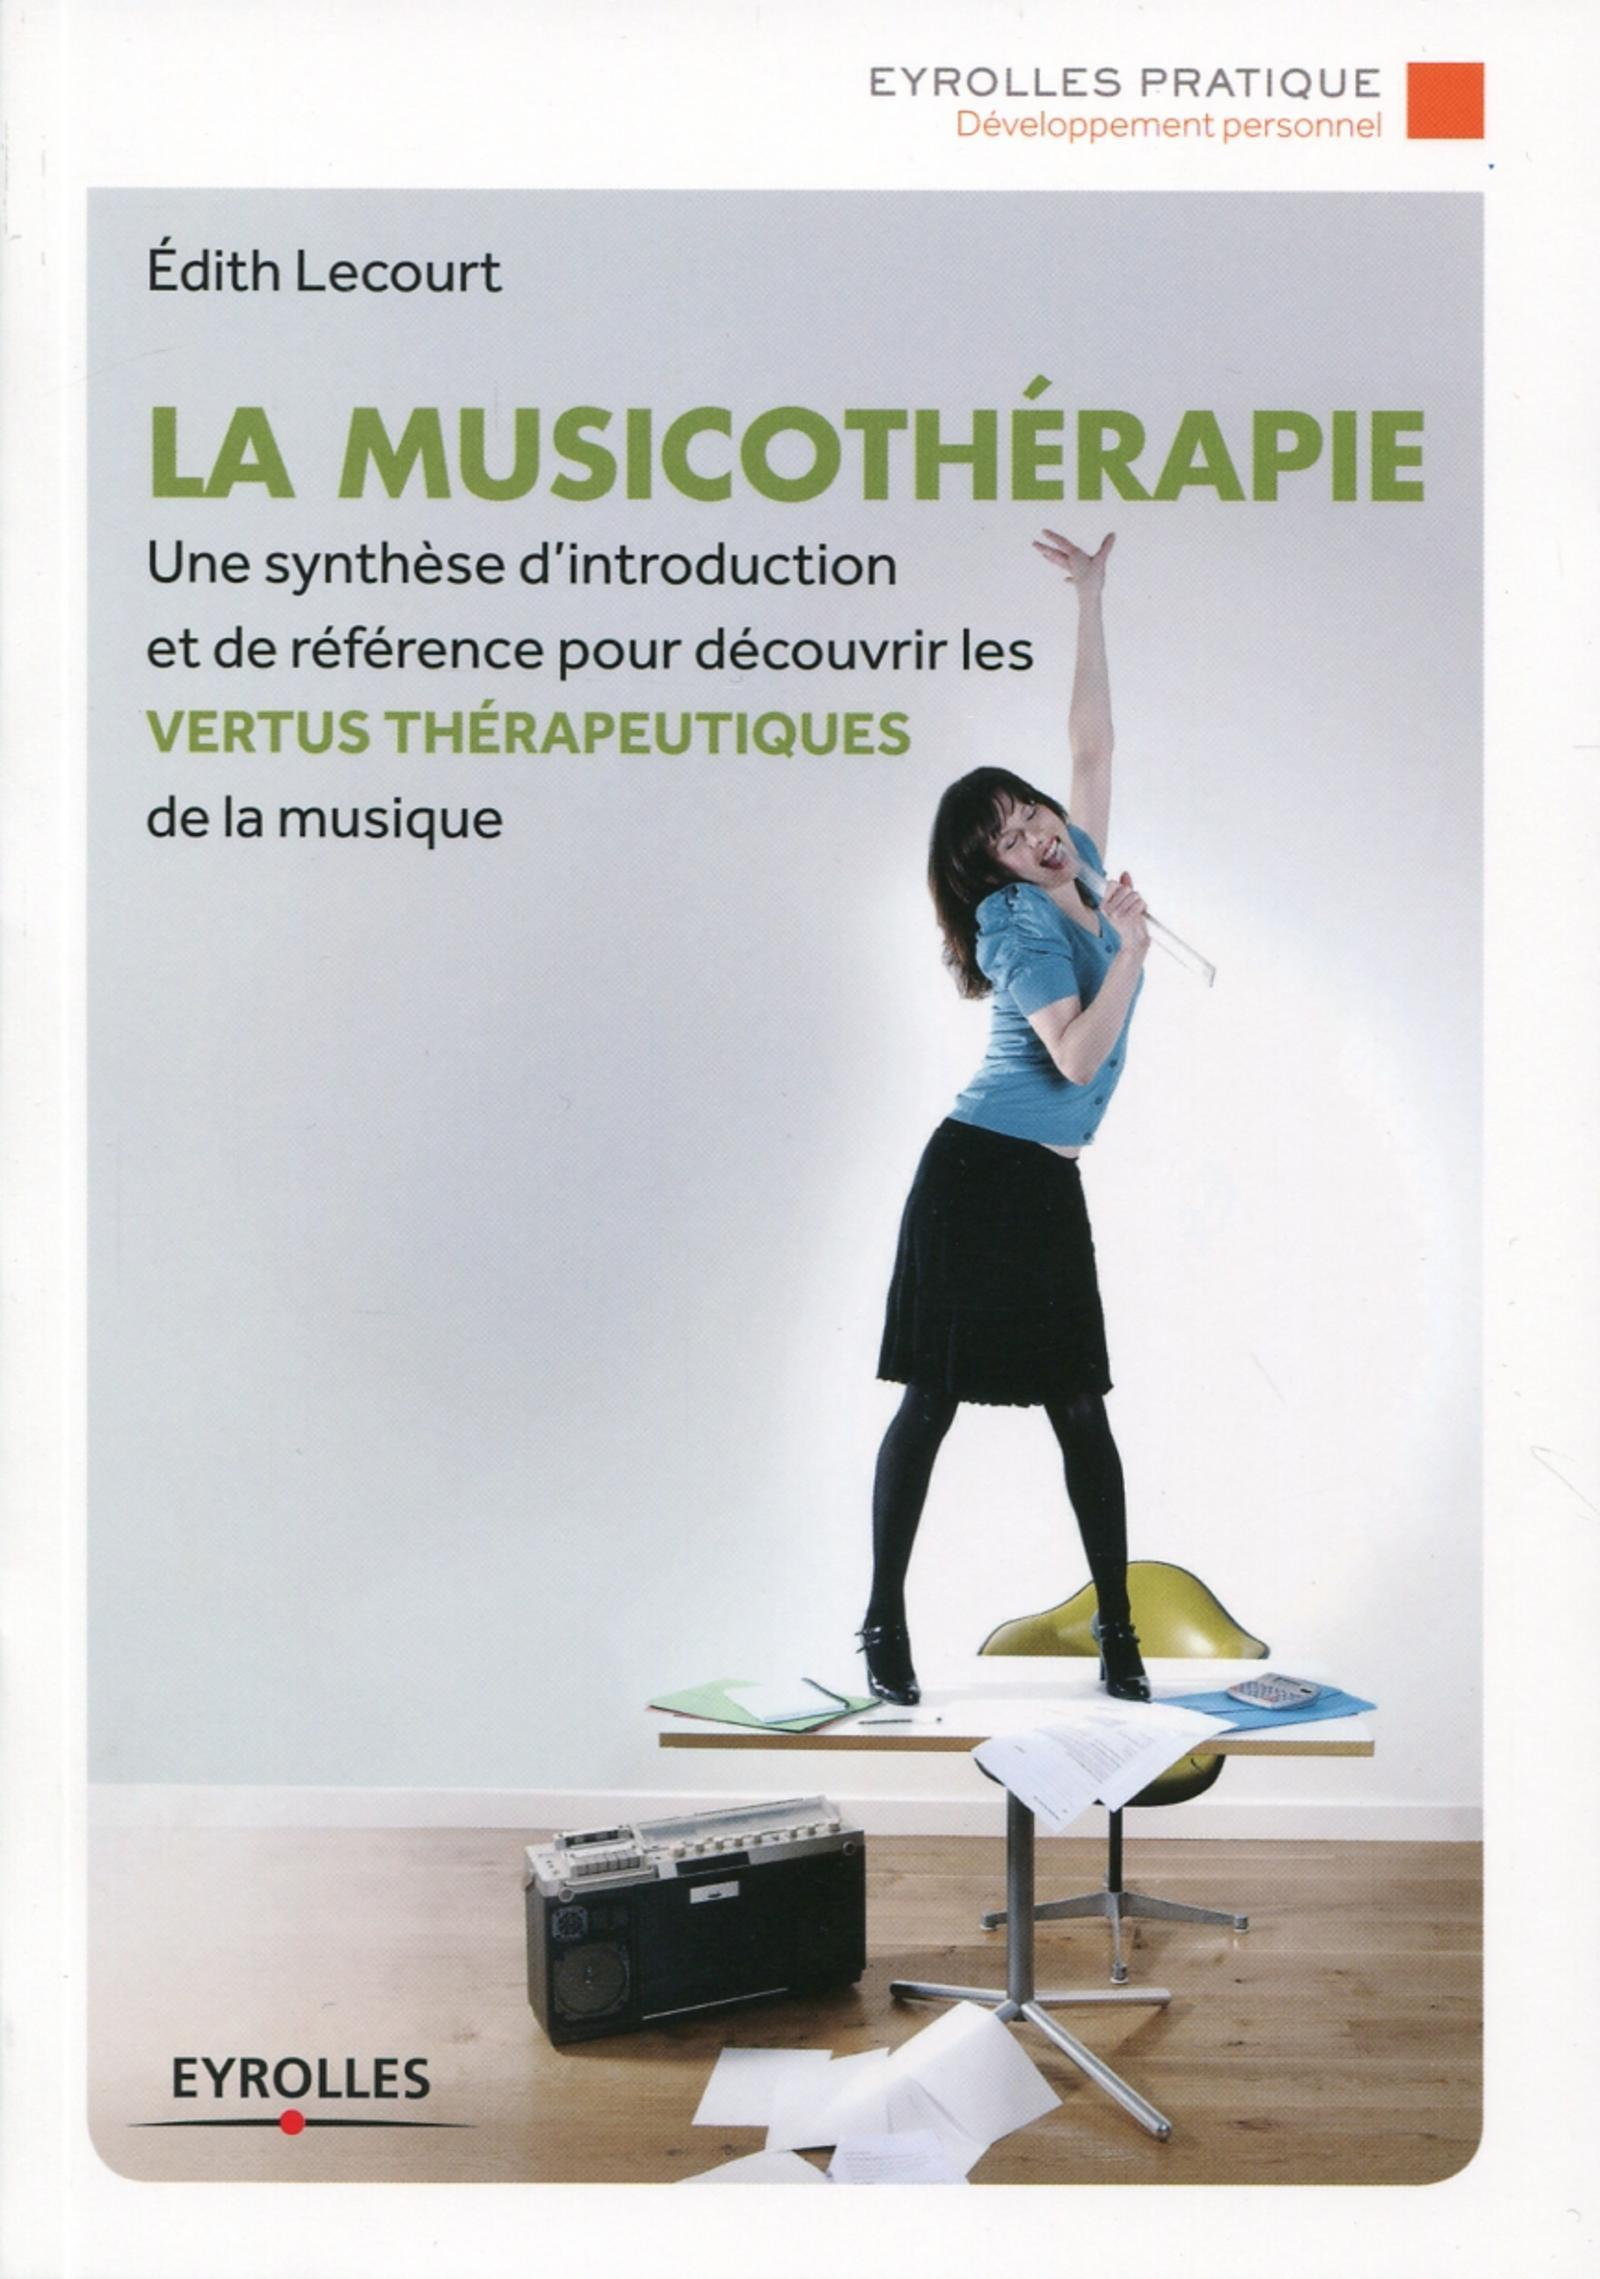 LA MUSICOTHERAPIE